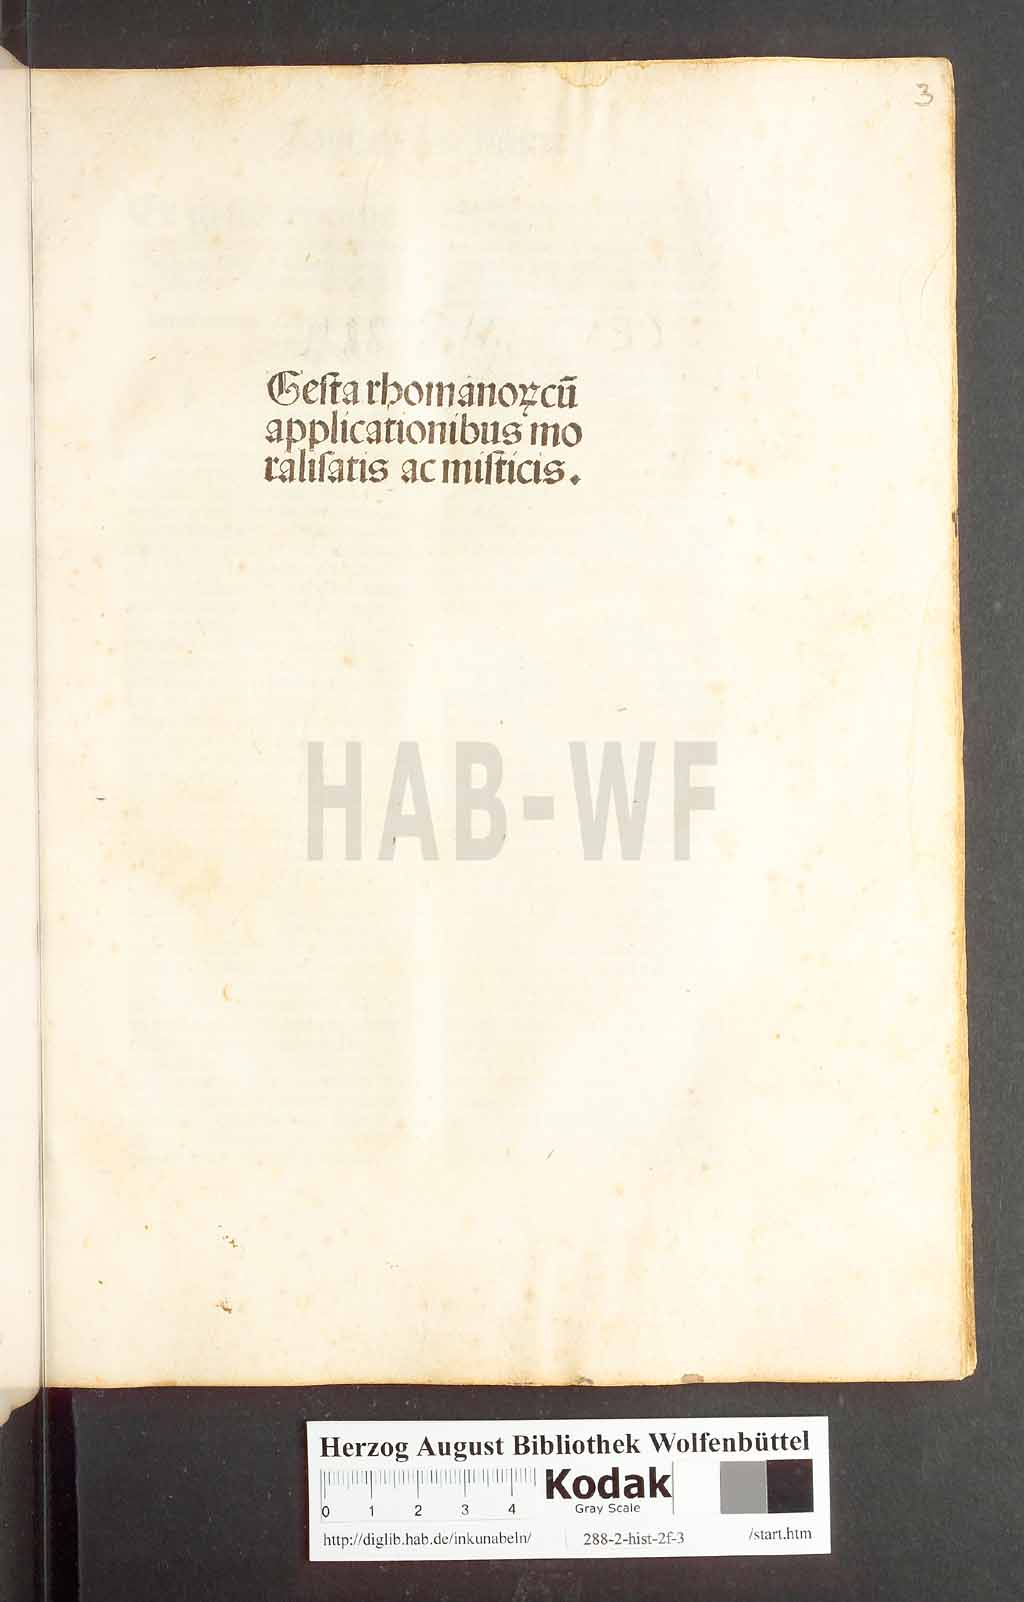 https://diglib.hab.de/inkunabeln/288-2-hist-2f-3/00001.jpg